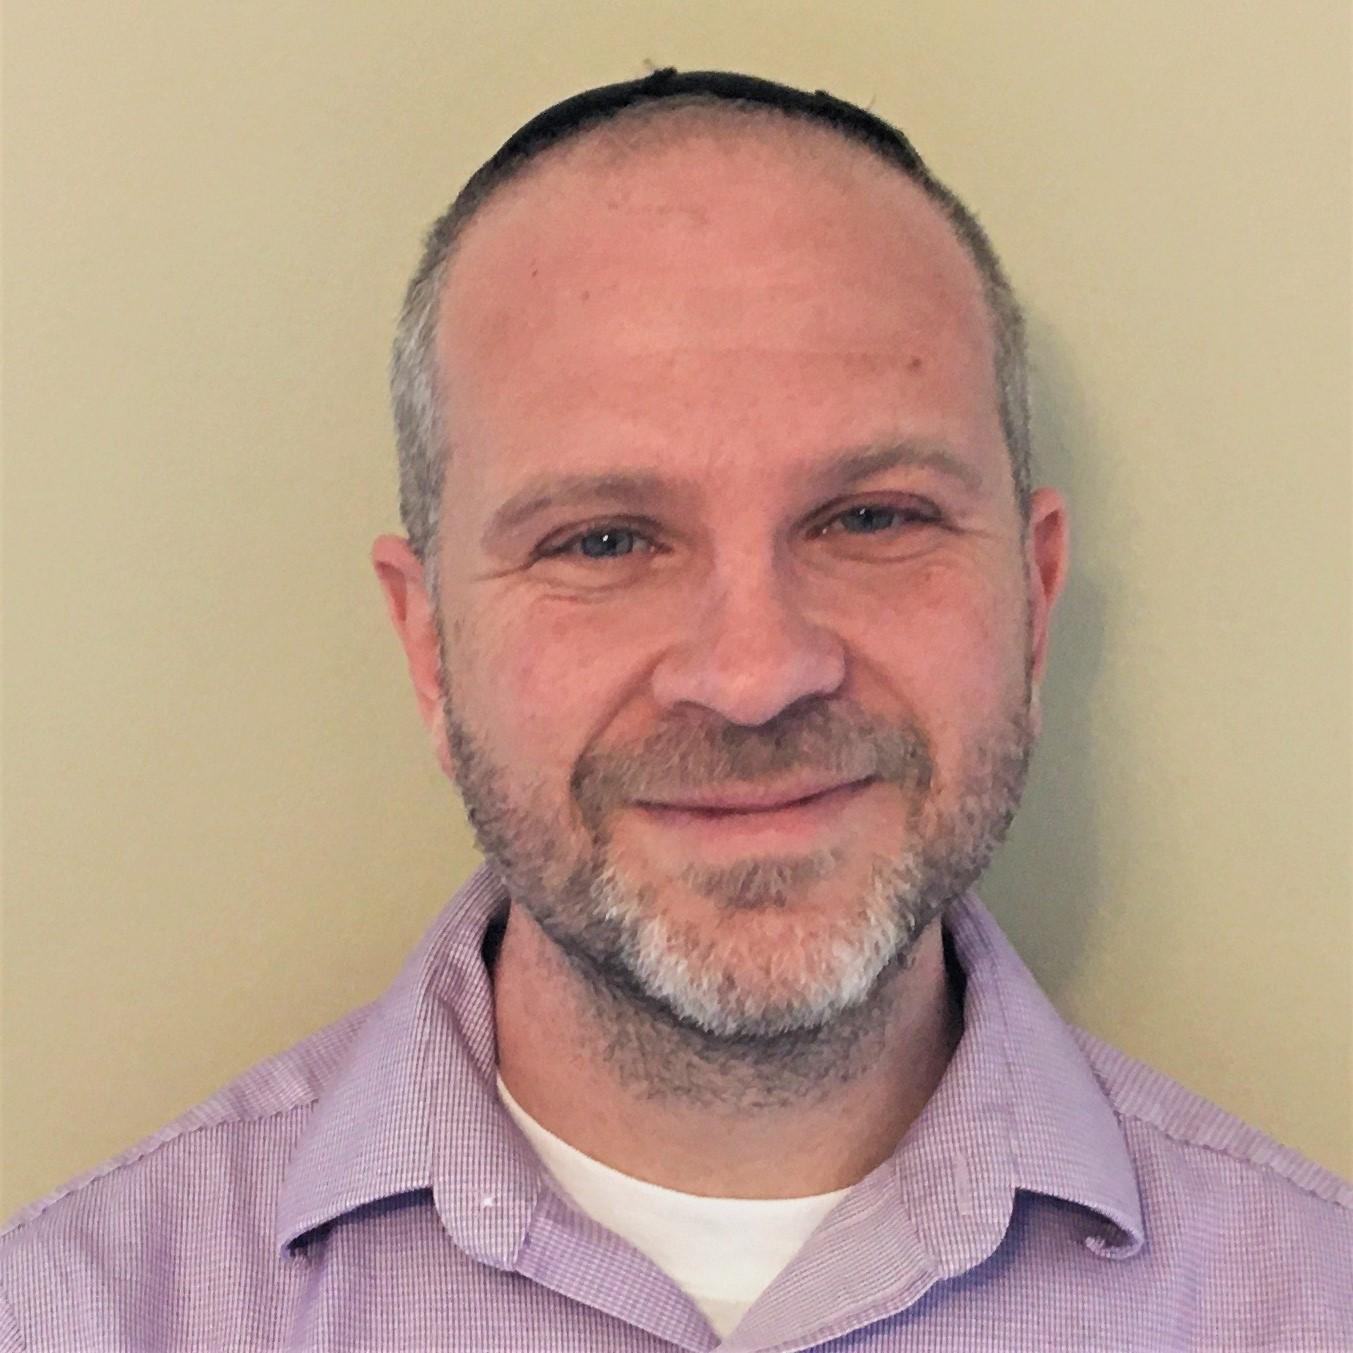 Dr. Jacob Kaiserman